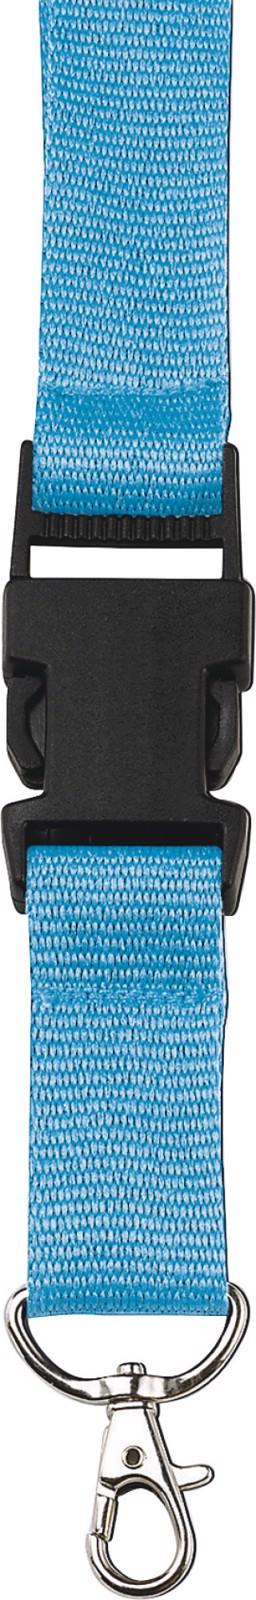 Polyester (300D) lanyard and key holder - Light Blue